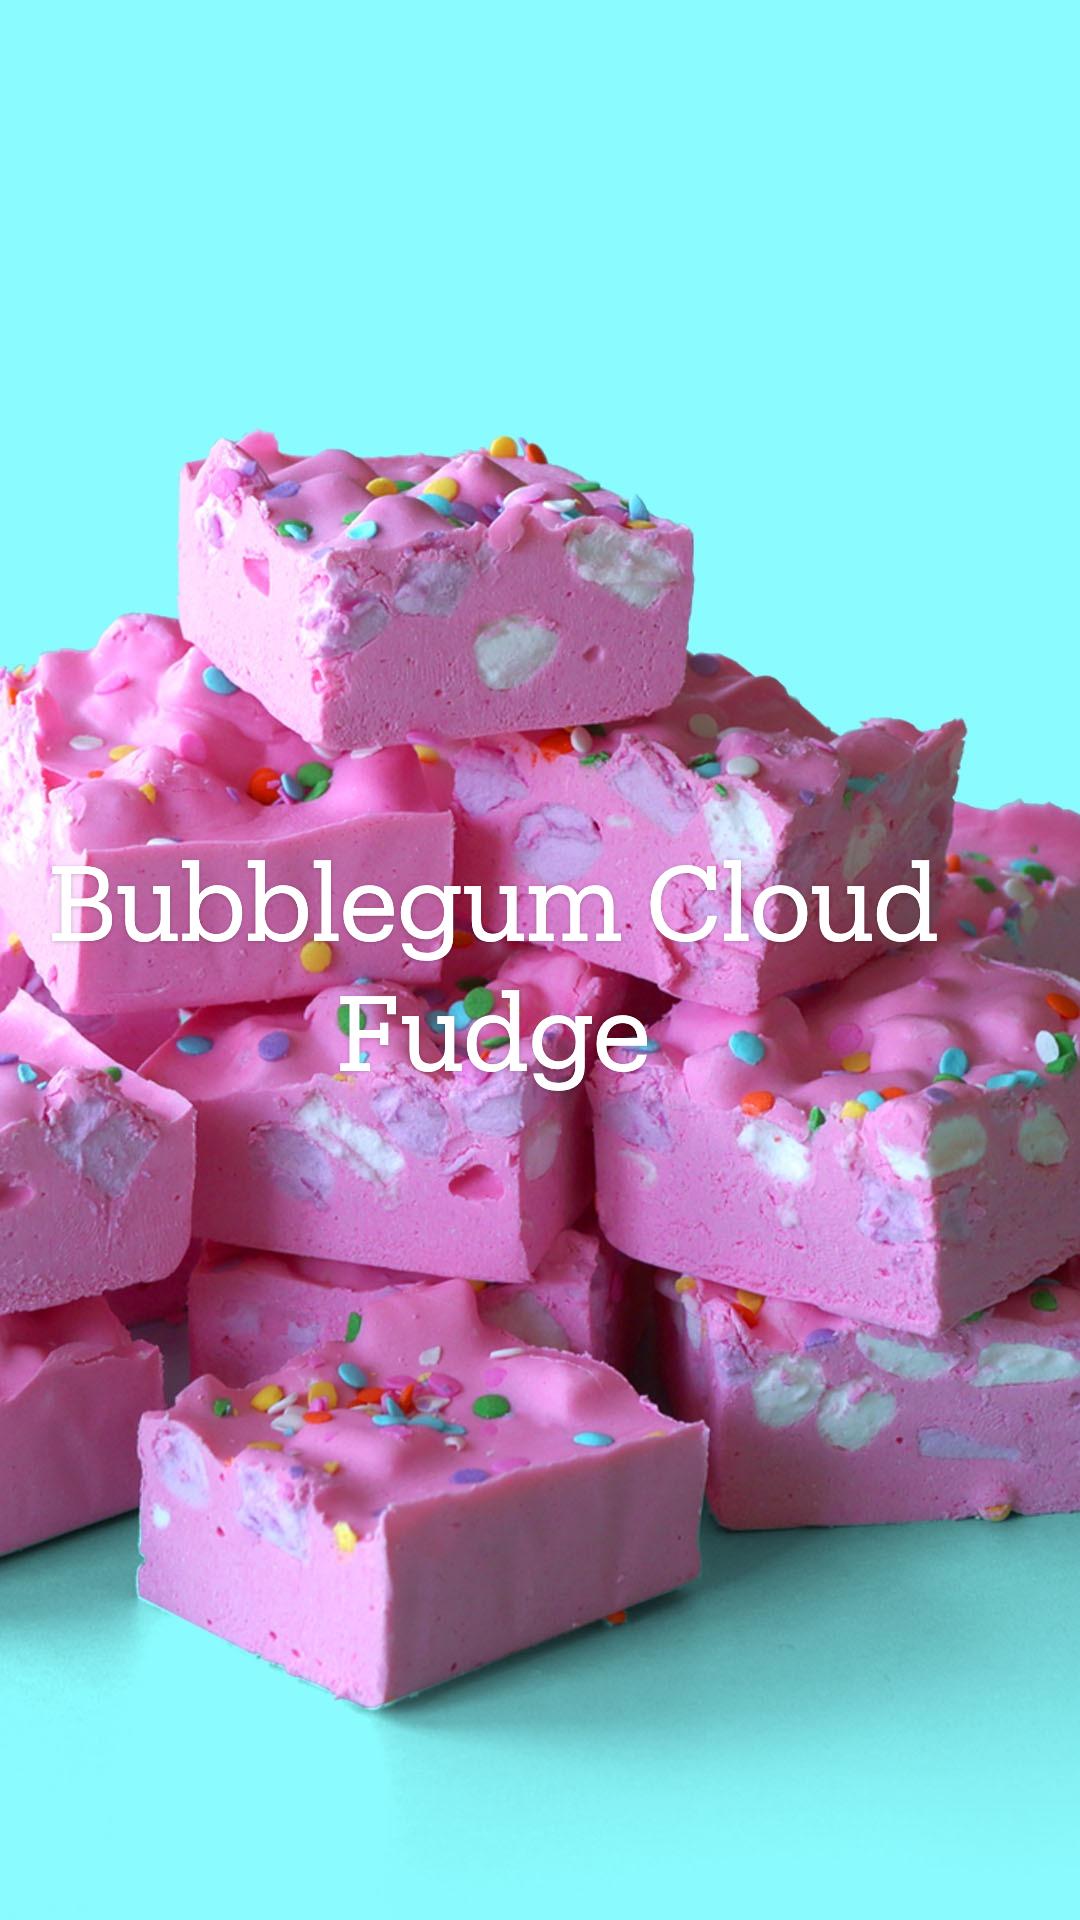 Bubblegum Cloud Fudge